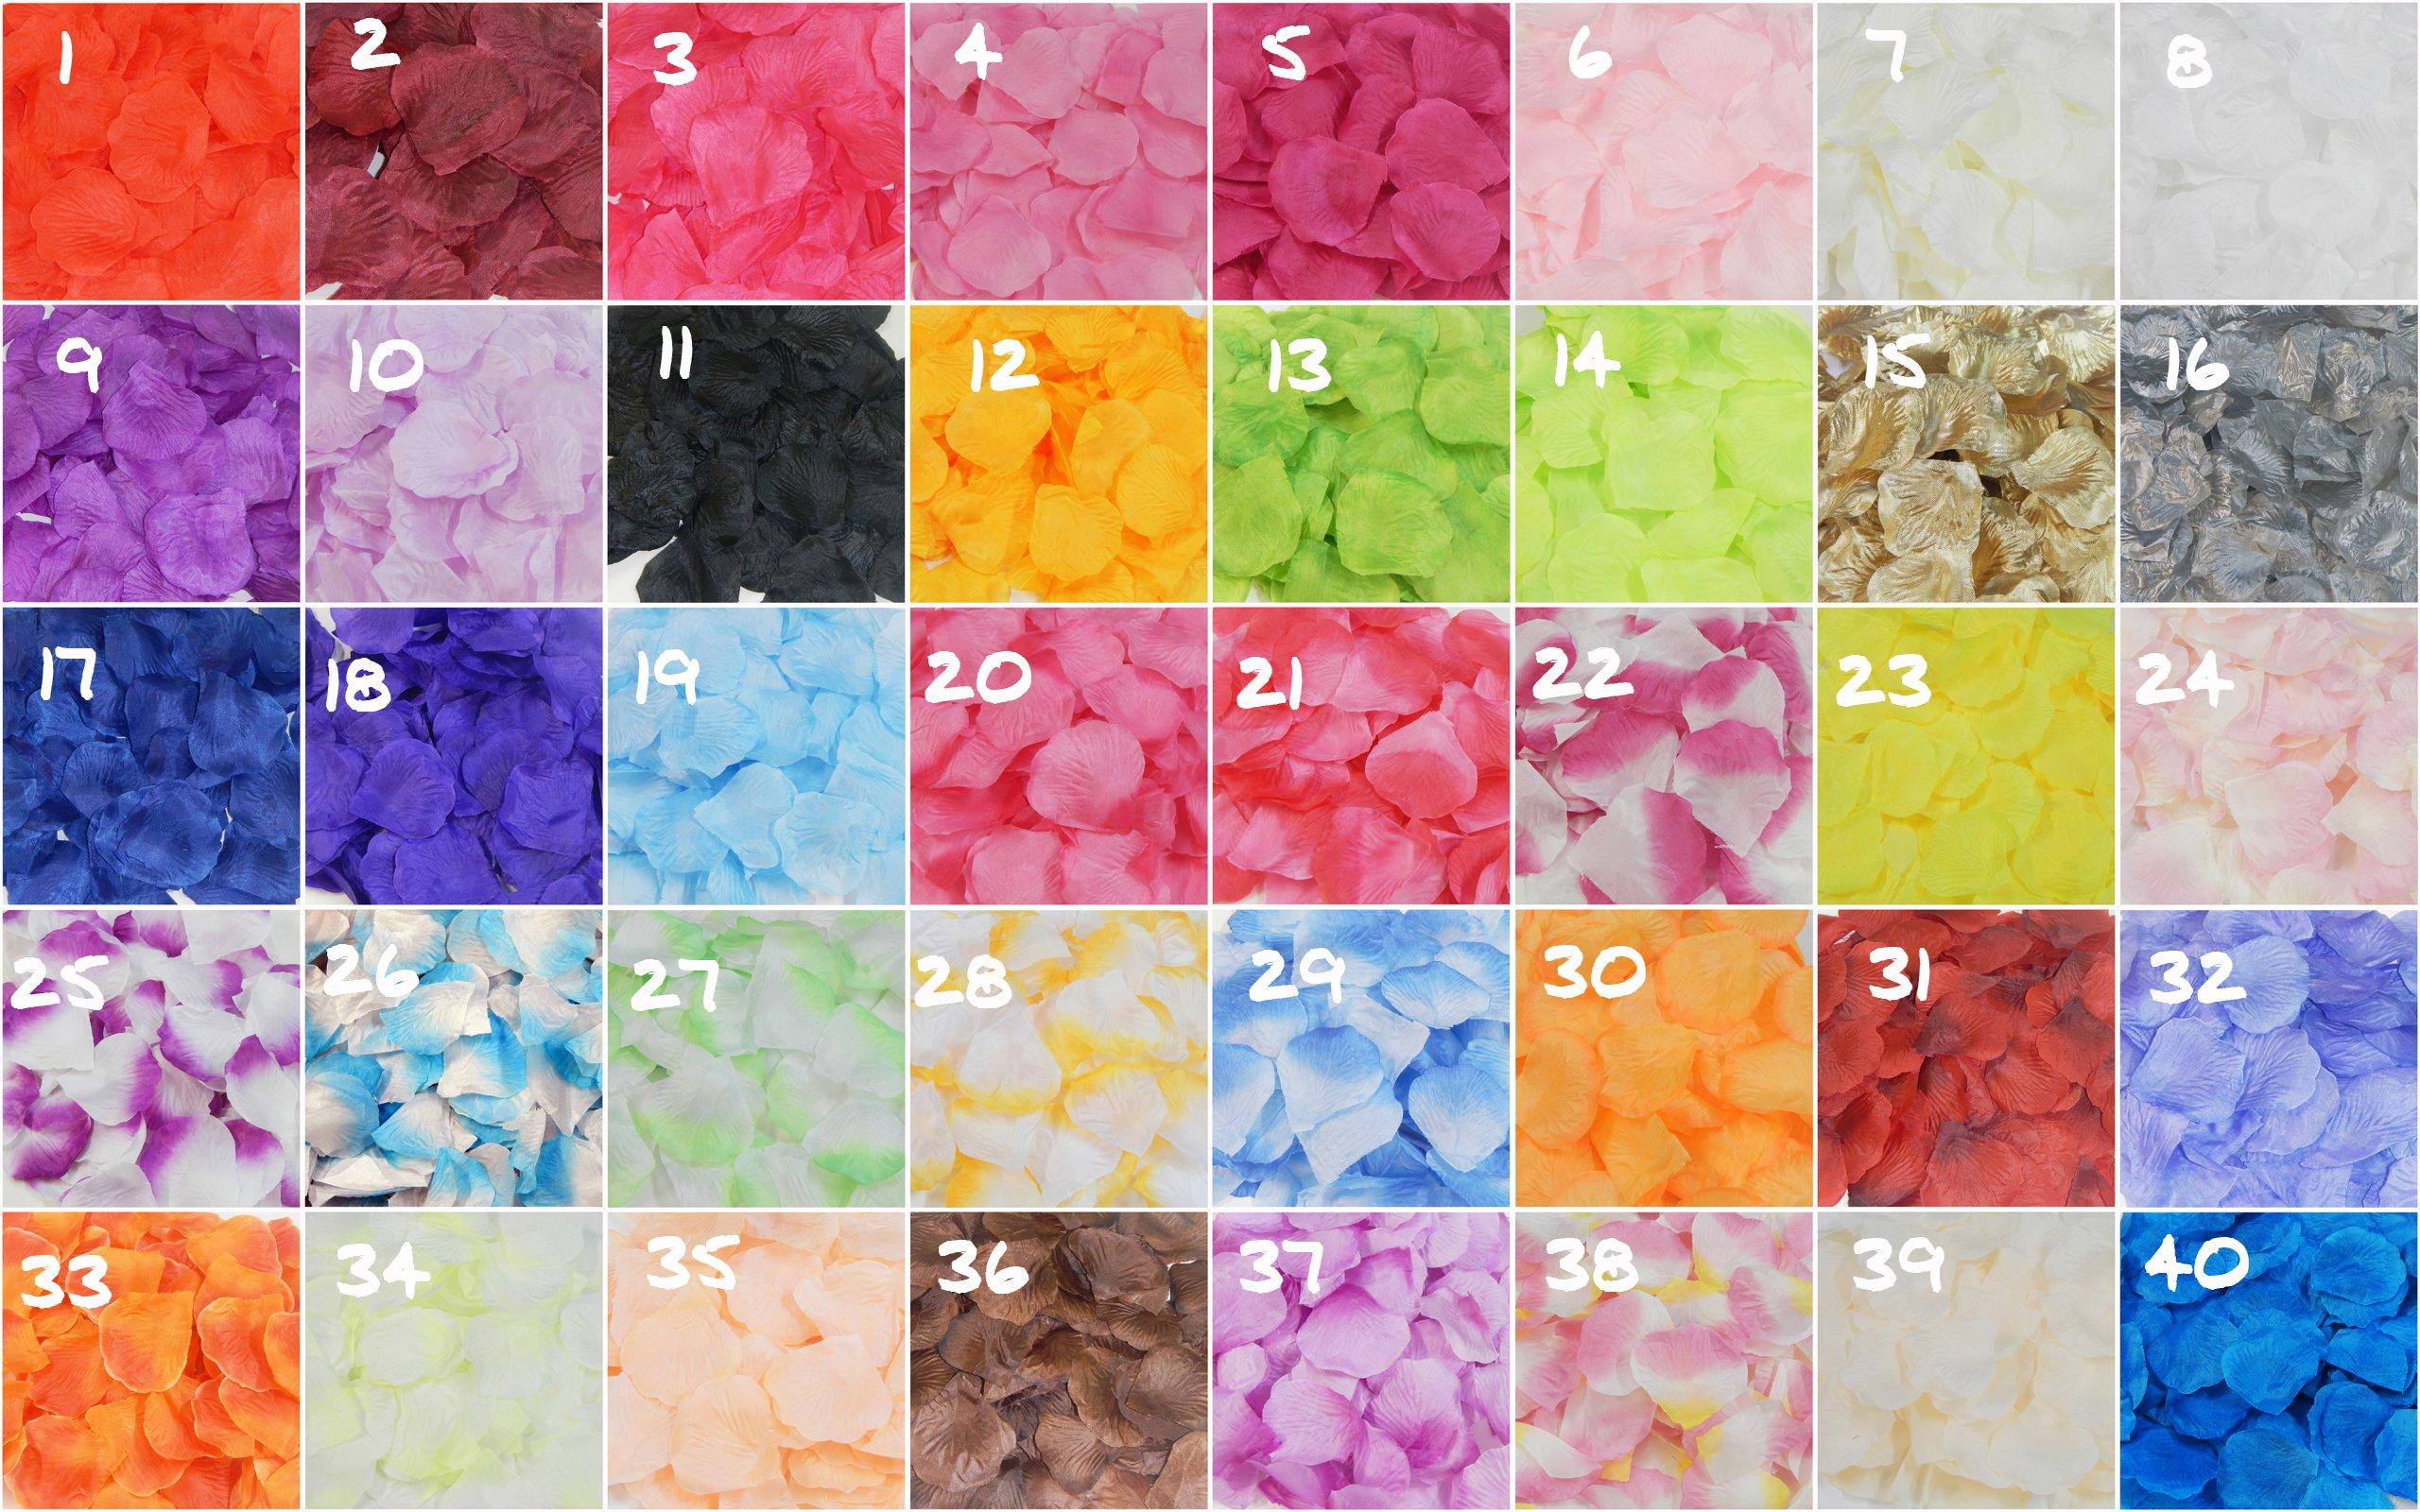 1000-Silk-Rose-Petals-for-Wedding-Flower-Bridal-Decoration-Girls-Baskets-Party-Etc-40-Color-to-Choose